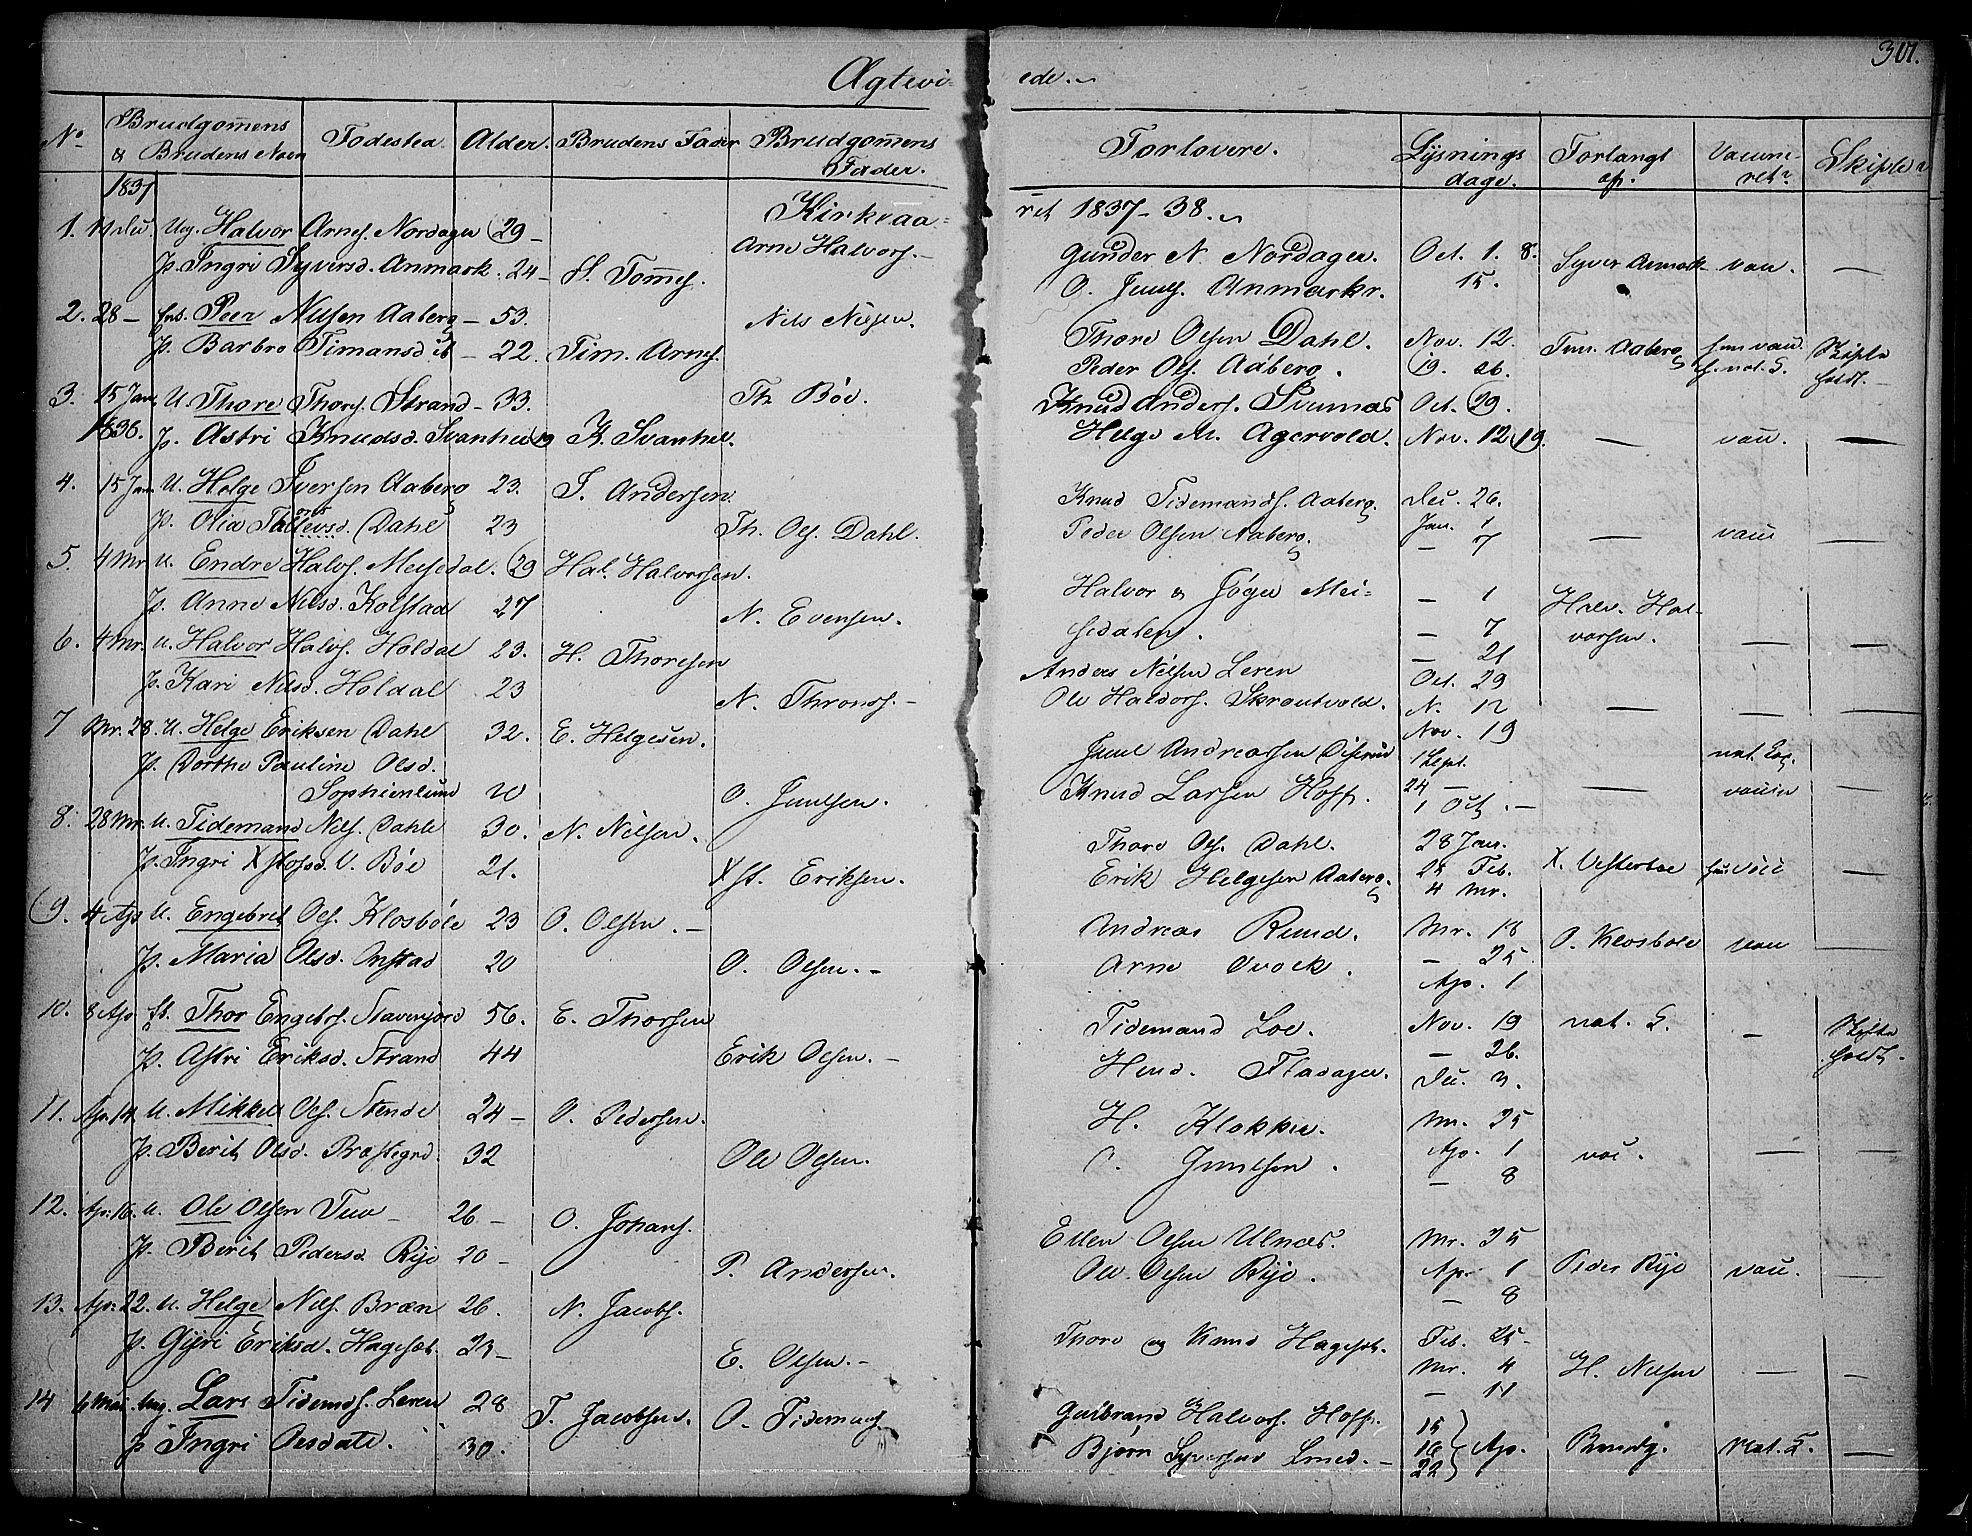 SAH, Nord-Aurdal prestekontor, Ministerialbok nr. 3, 1828-1841, s. 261